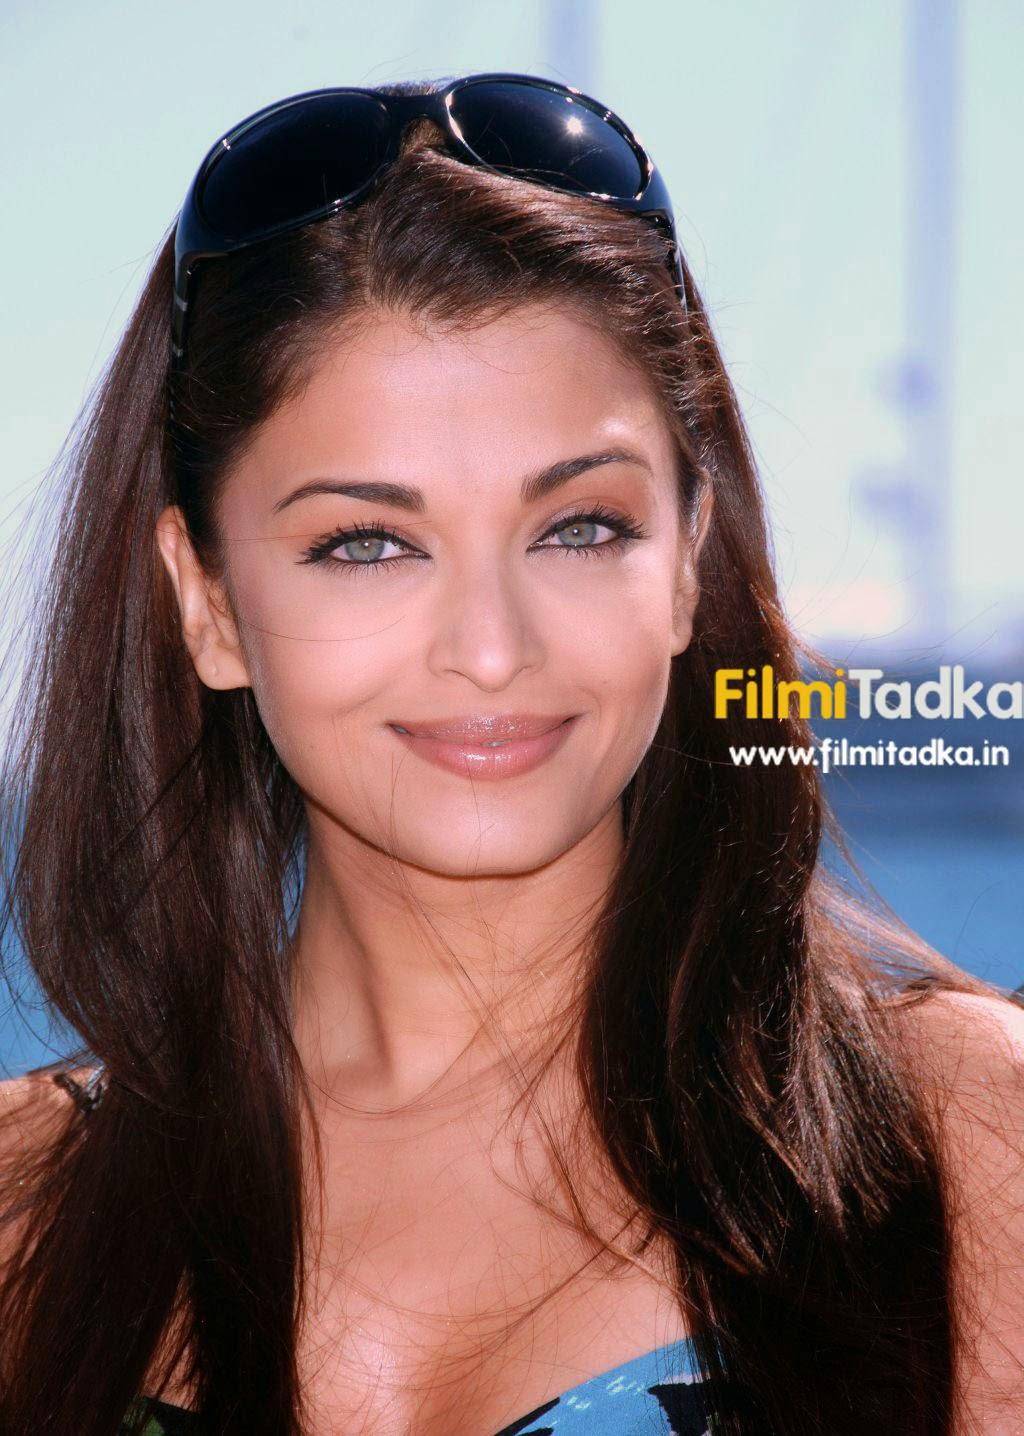 Biografi Aishwarya Rai Bachchan